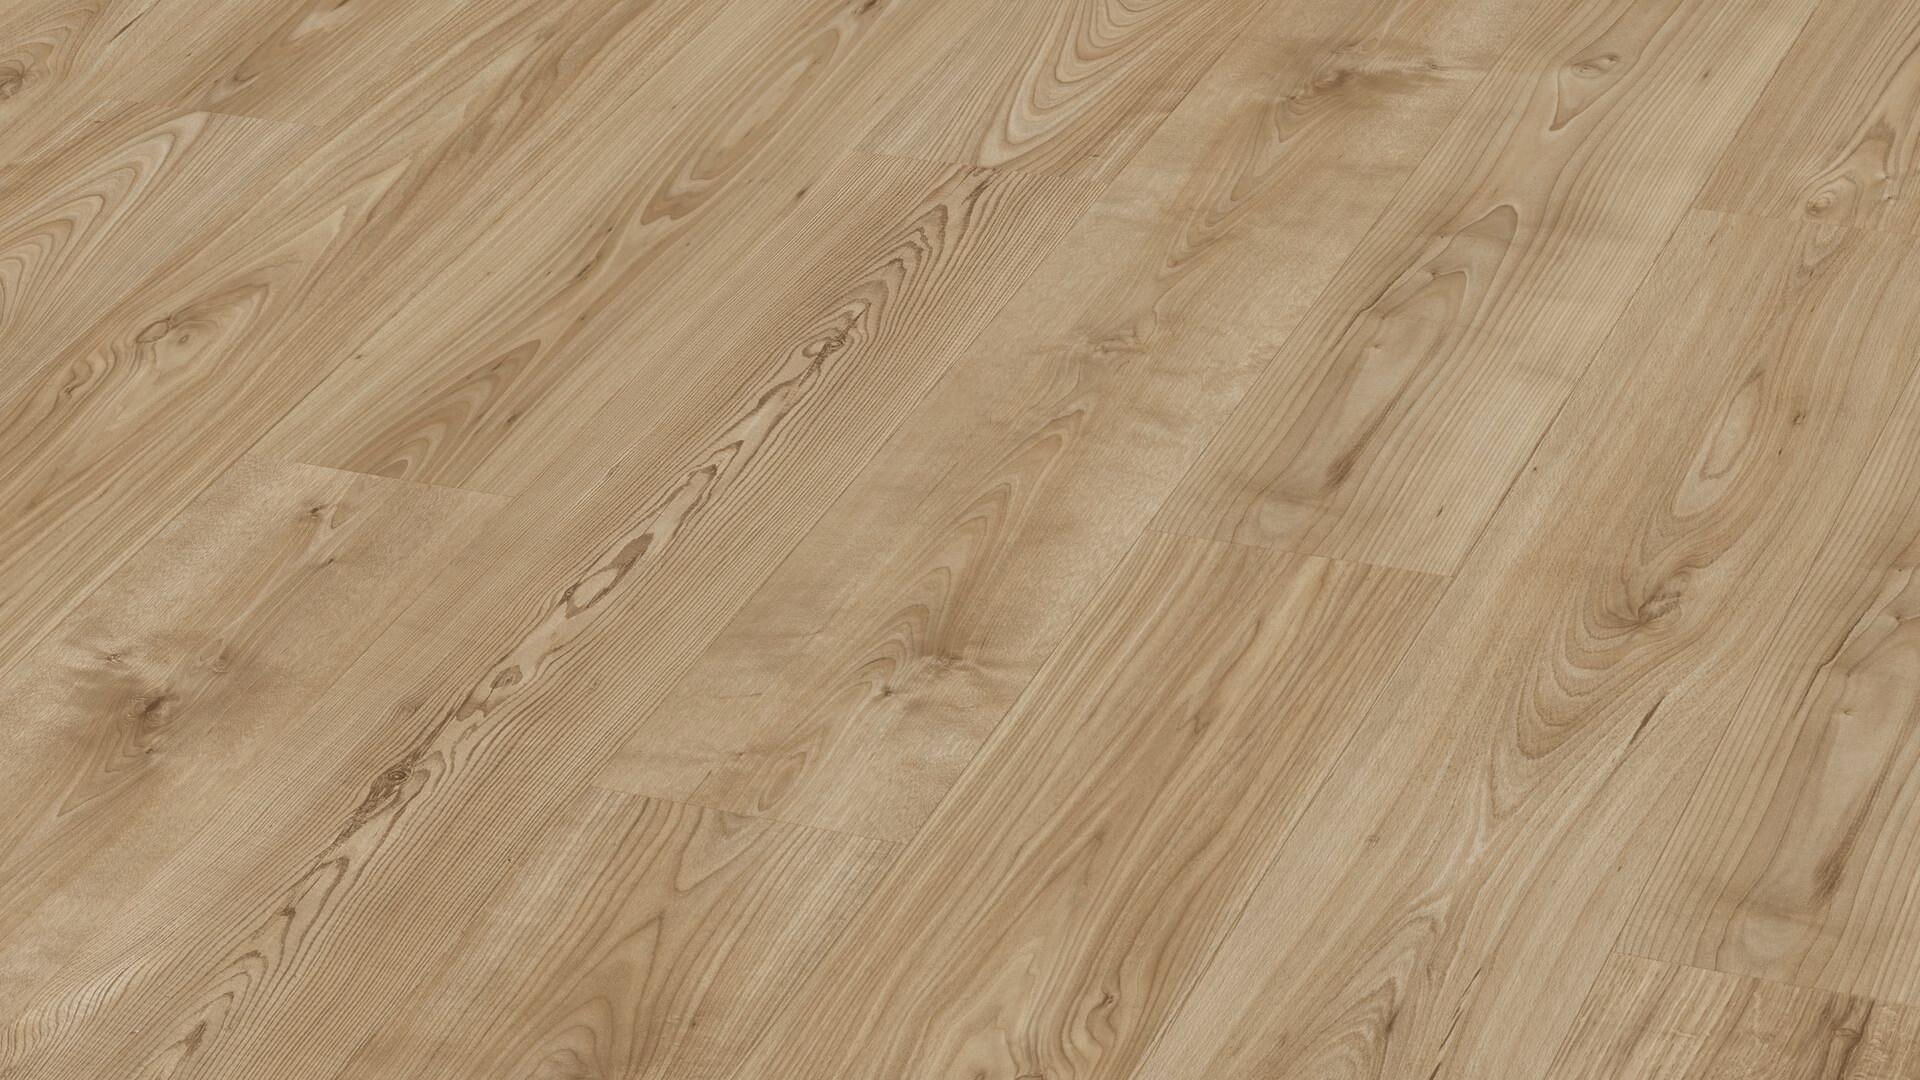 Laminat MeisterDesign. laminate LD 150 Multiwood 6849